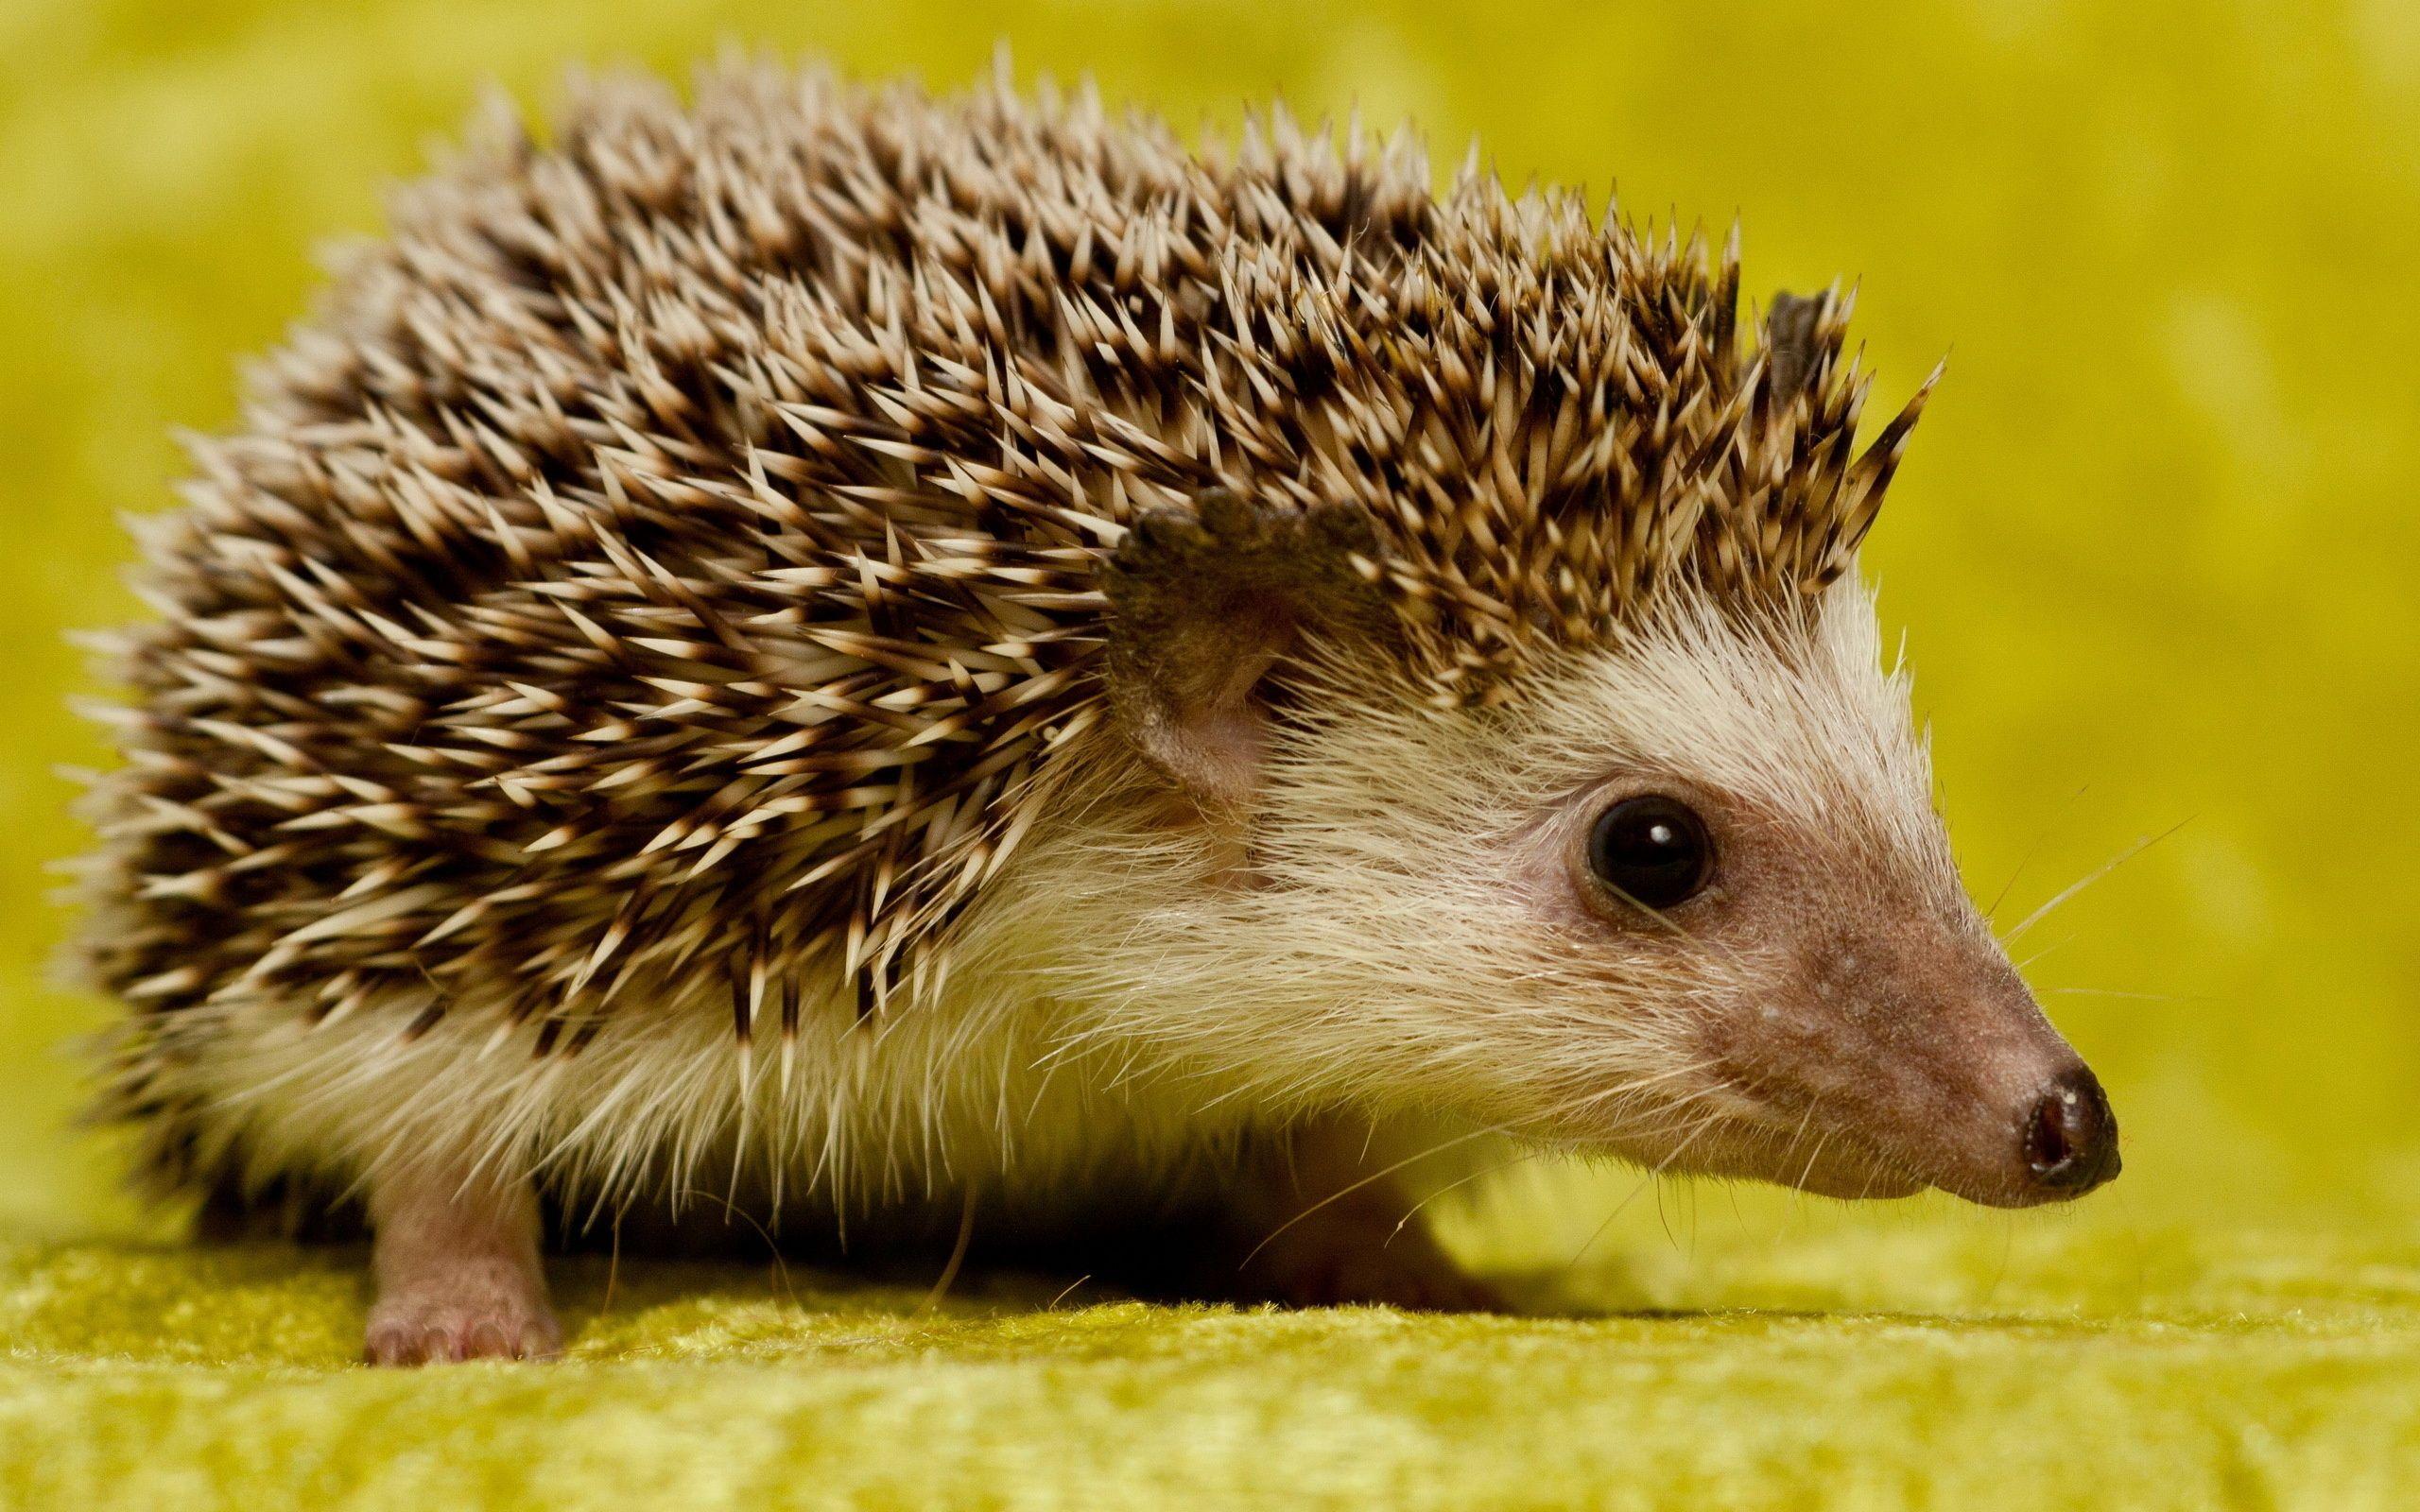 Baby Hedgehog Cute hedgehog, Baby hedgehog, Animal